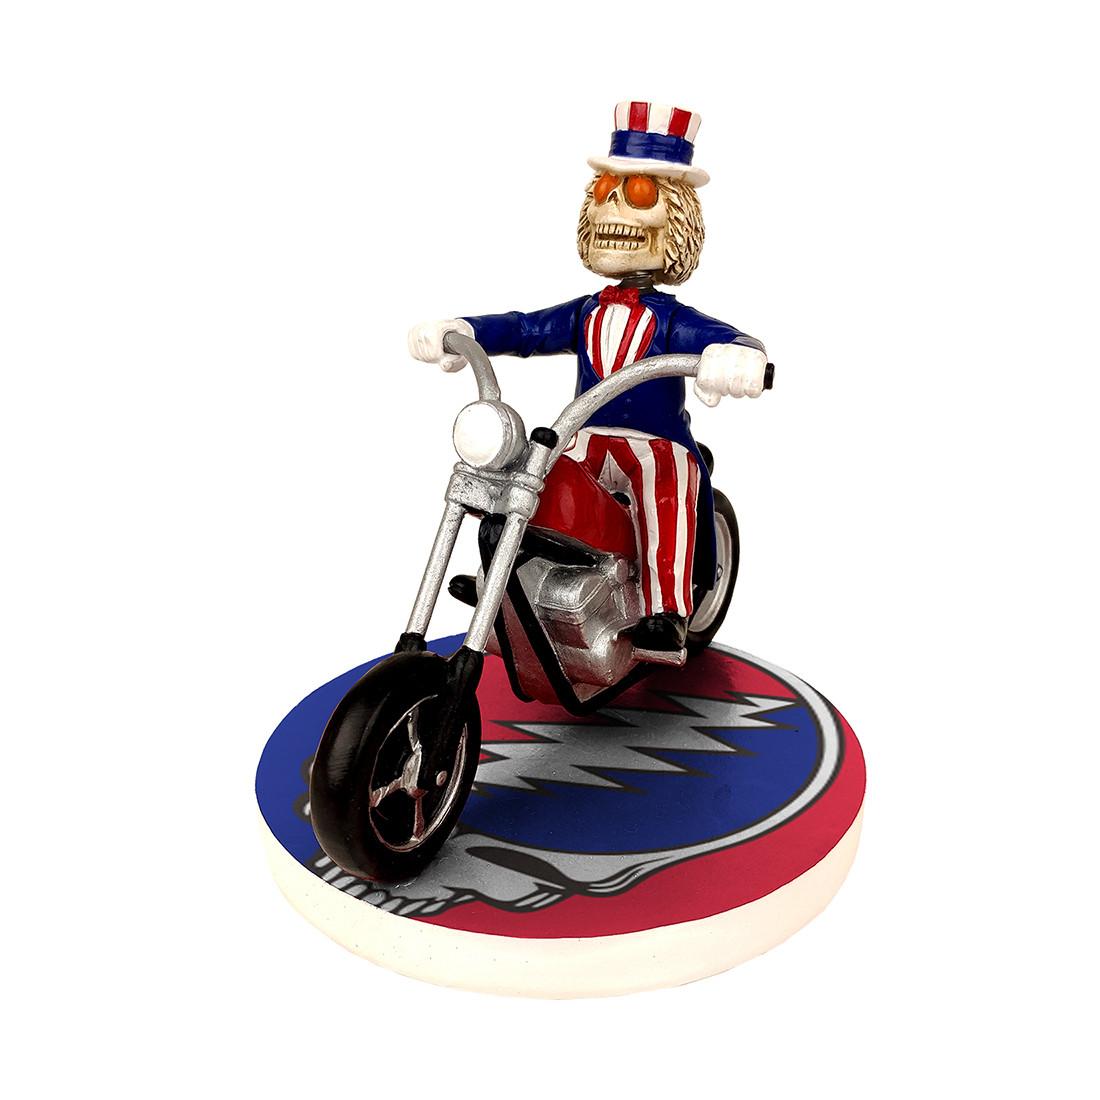 GD Bobblehead Moto Sam